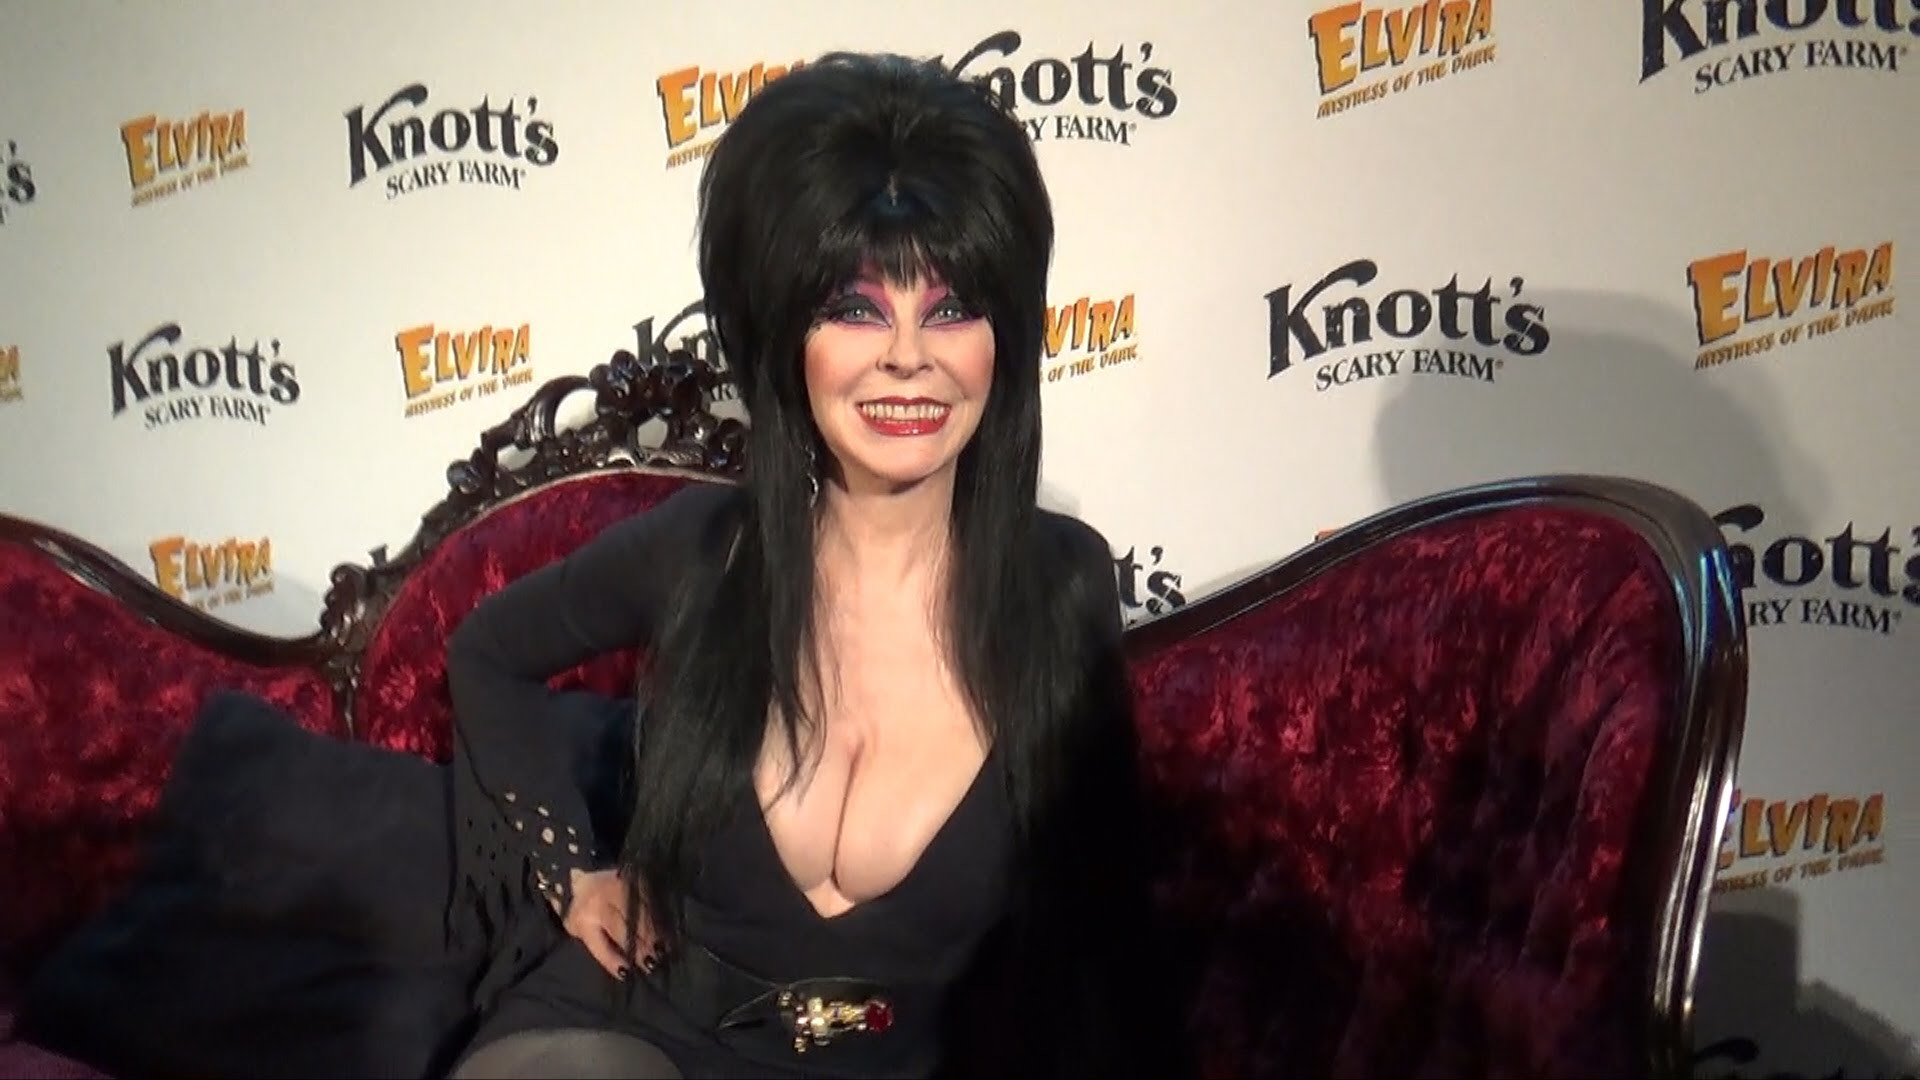 Elvira: Mistress of the Dark (Cassandra Peterson) Interview at Knott's  Scary Farm Halloween Preview – YouTube